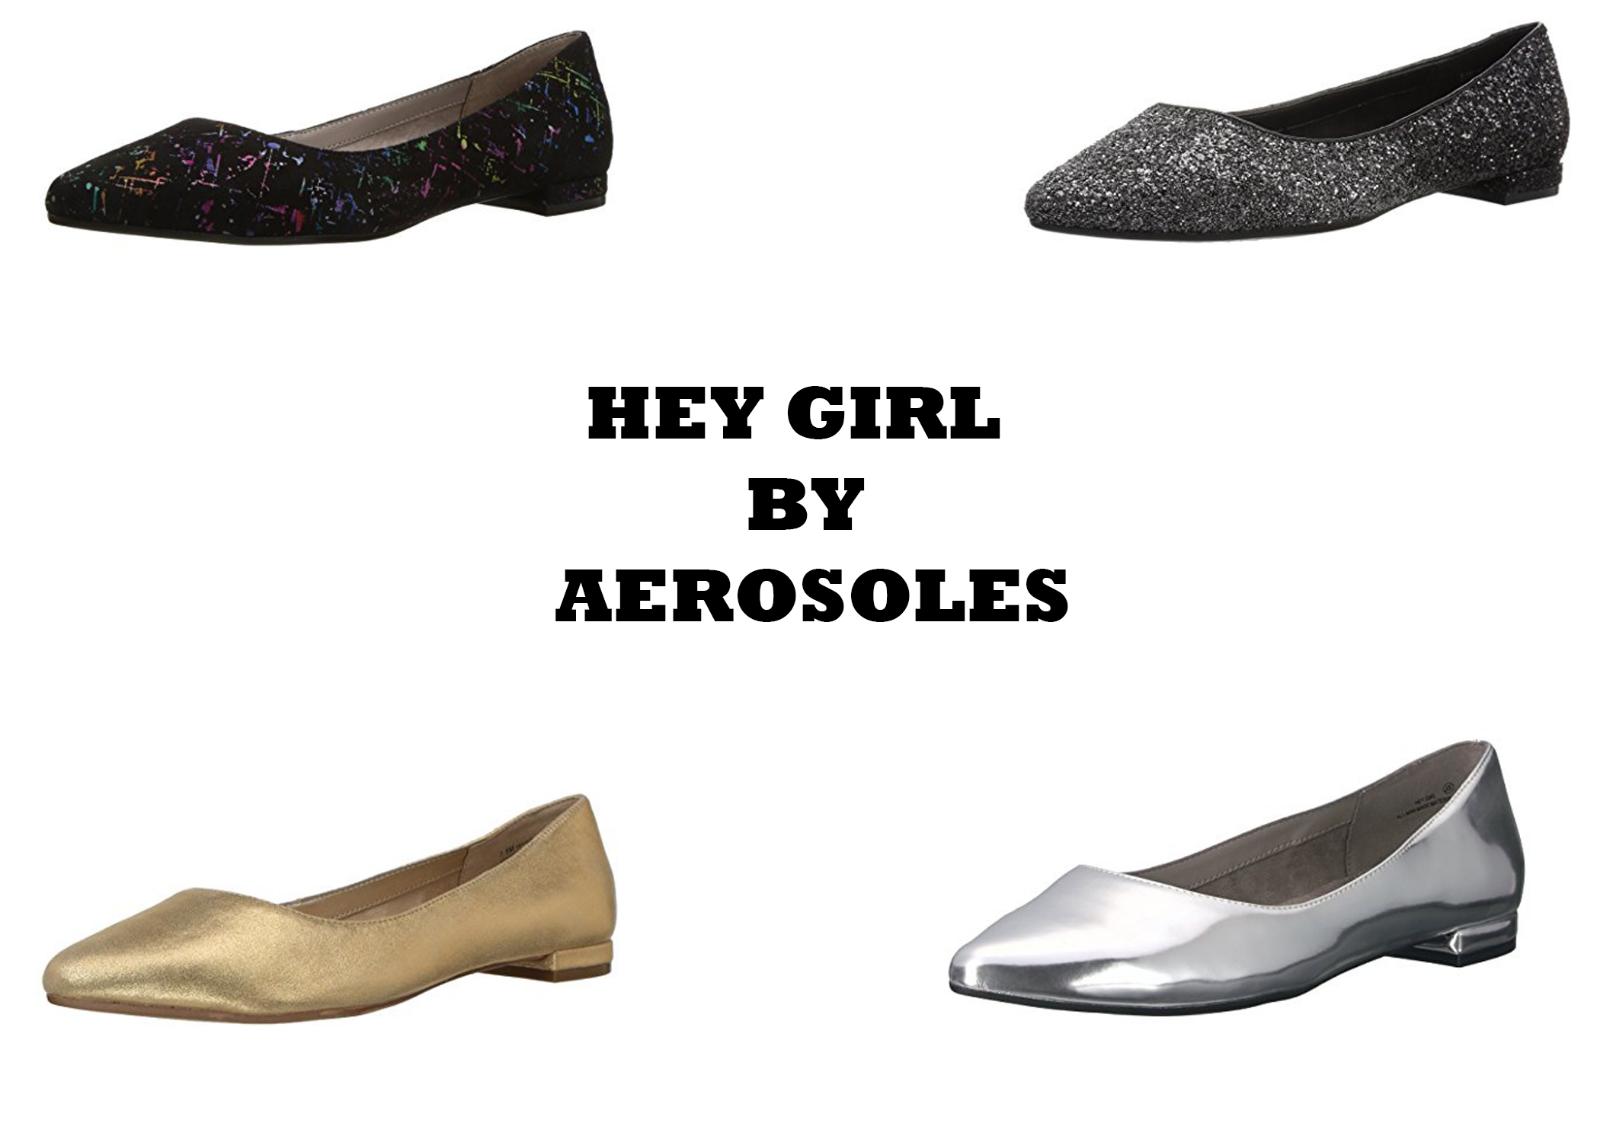 Aerosoles Wouomo Hey Girl Ballet Ballet Ballet Flat 98fa94